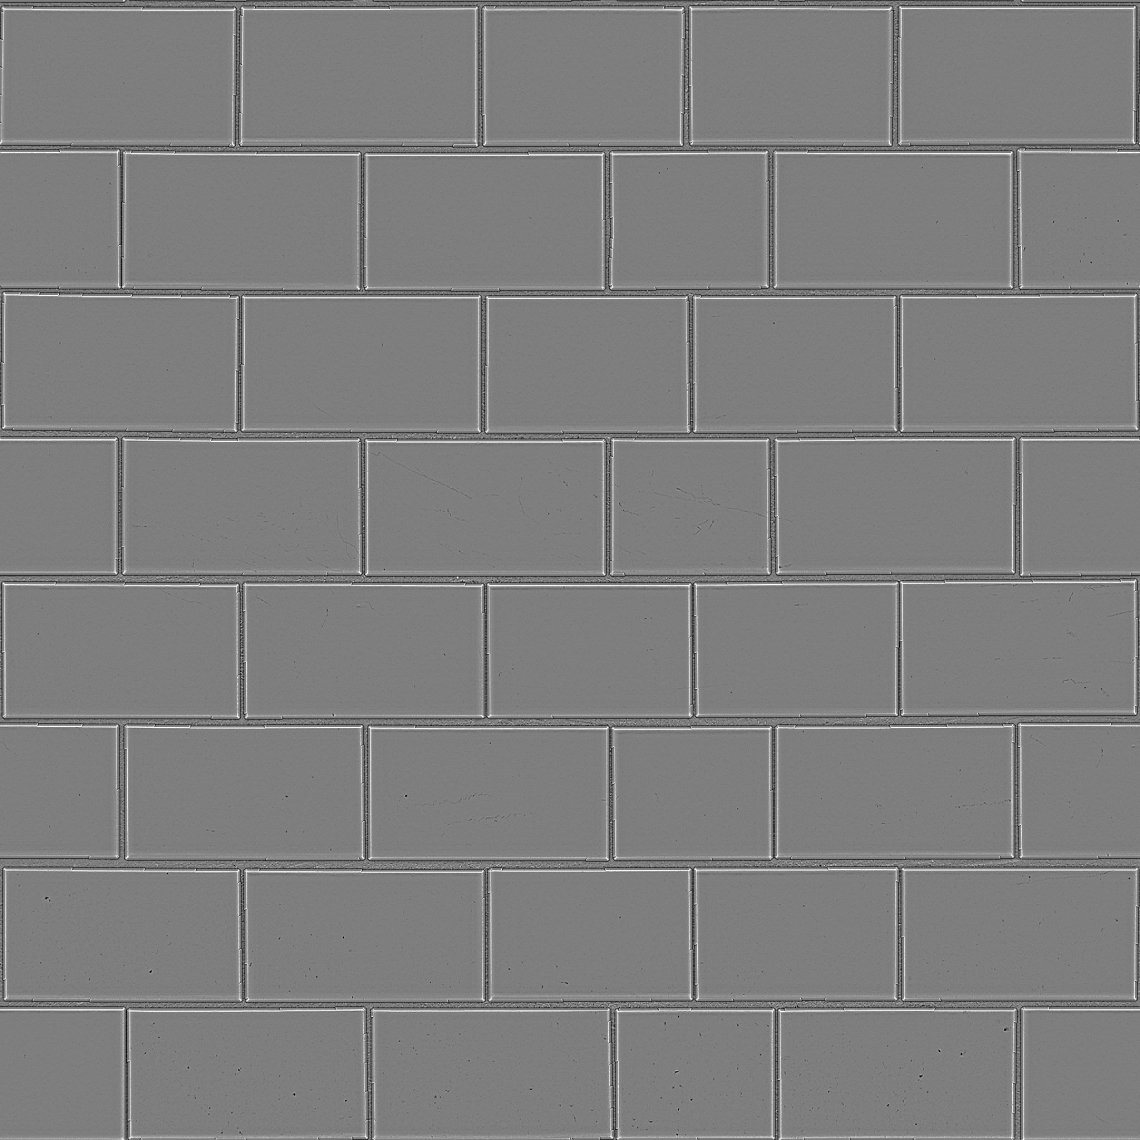 Simple-Tiles-04-Curvature